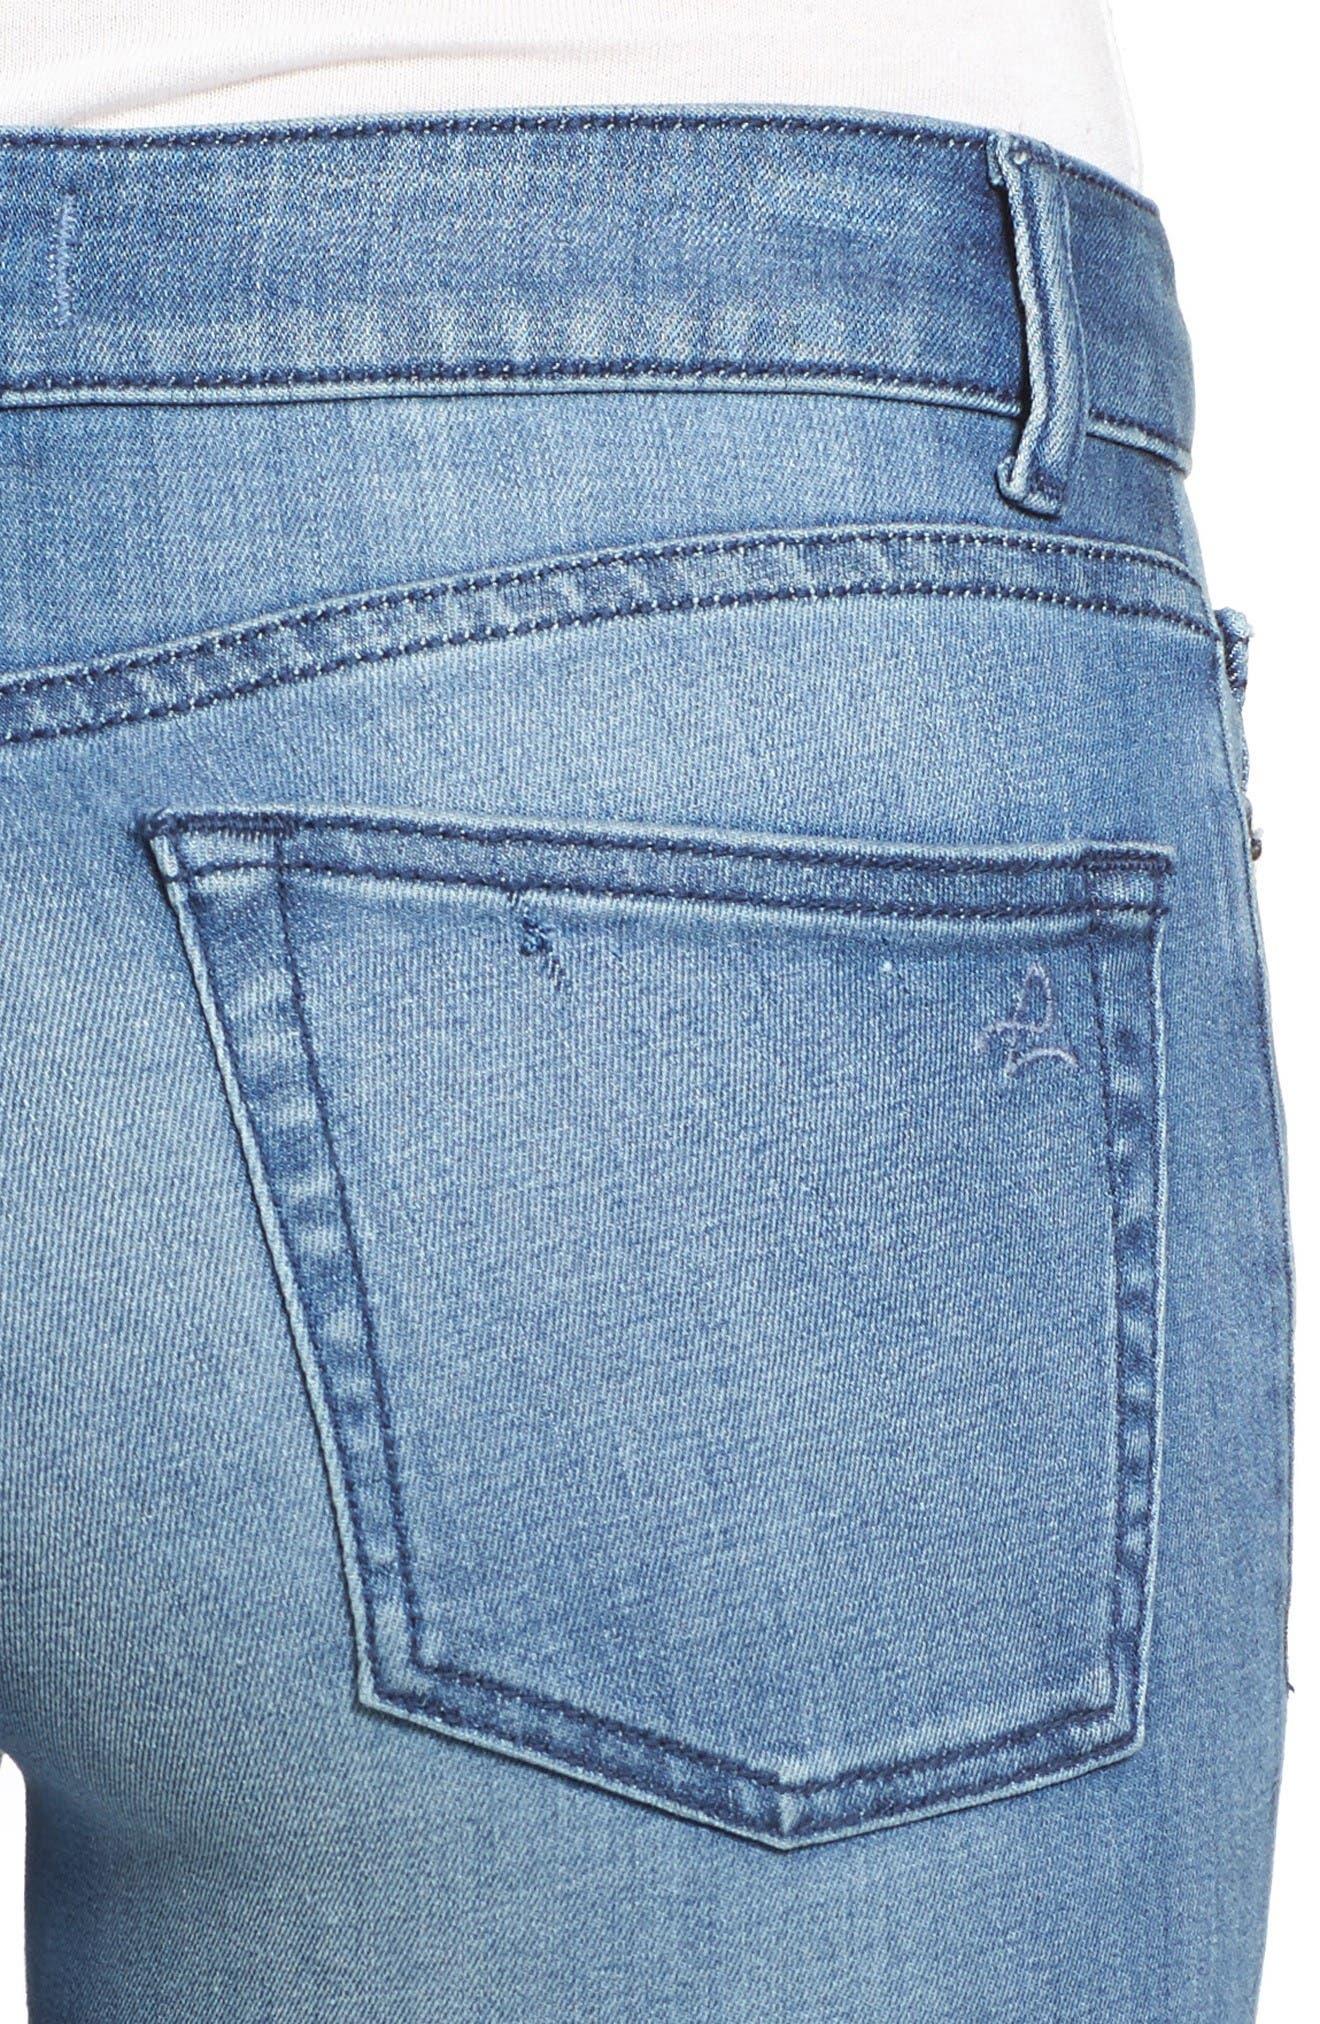 Florence Instasculpt Skinny Jeans,                             Alternate thumbnail 4, color,                             Godiva